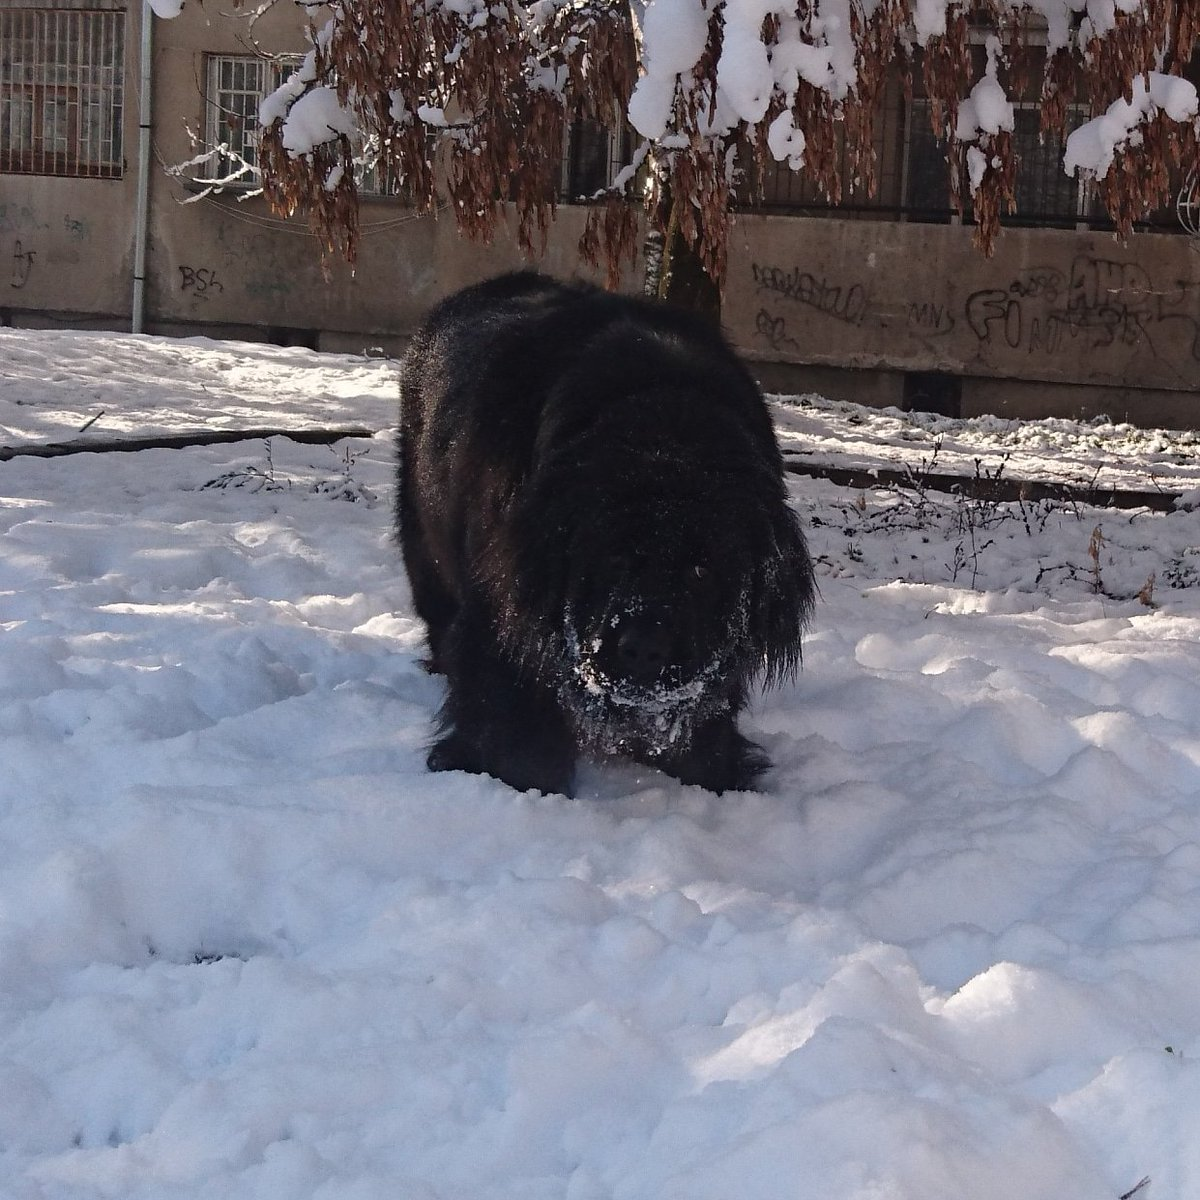 Snow fun   #fairytale #newfoundland #dogs #pet #puppy #newfie #cute #beautiful #dogsoftwitter #puppylove #friend #dogsofinstagram #instadog #bestfriend #love #snow #winter #winteriscoming<br>http://pic.twitter.com/mDAm9BlxO8